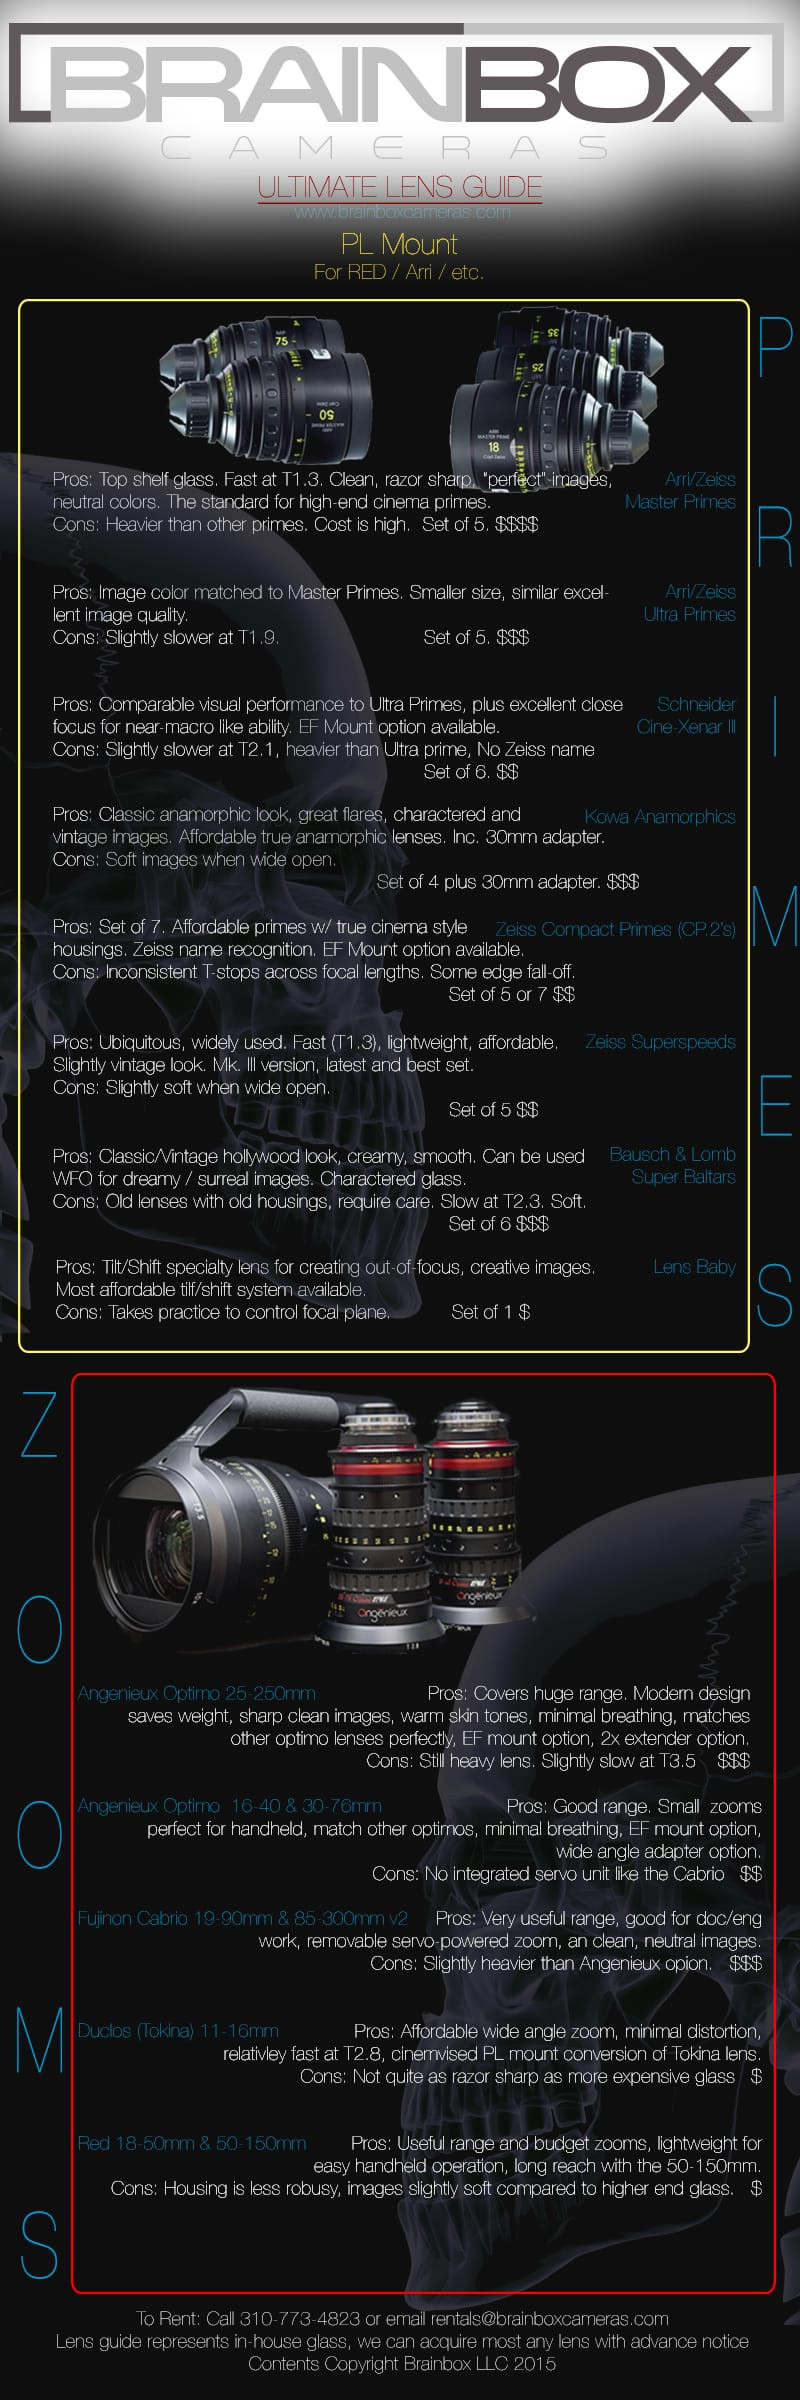 BrainBox Cameras' Camera Lenses Guide infographic